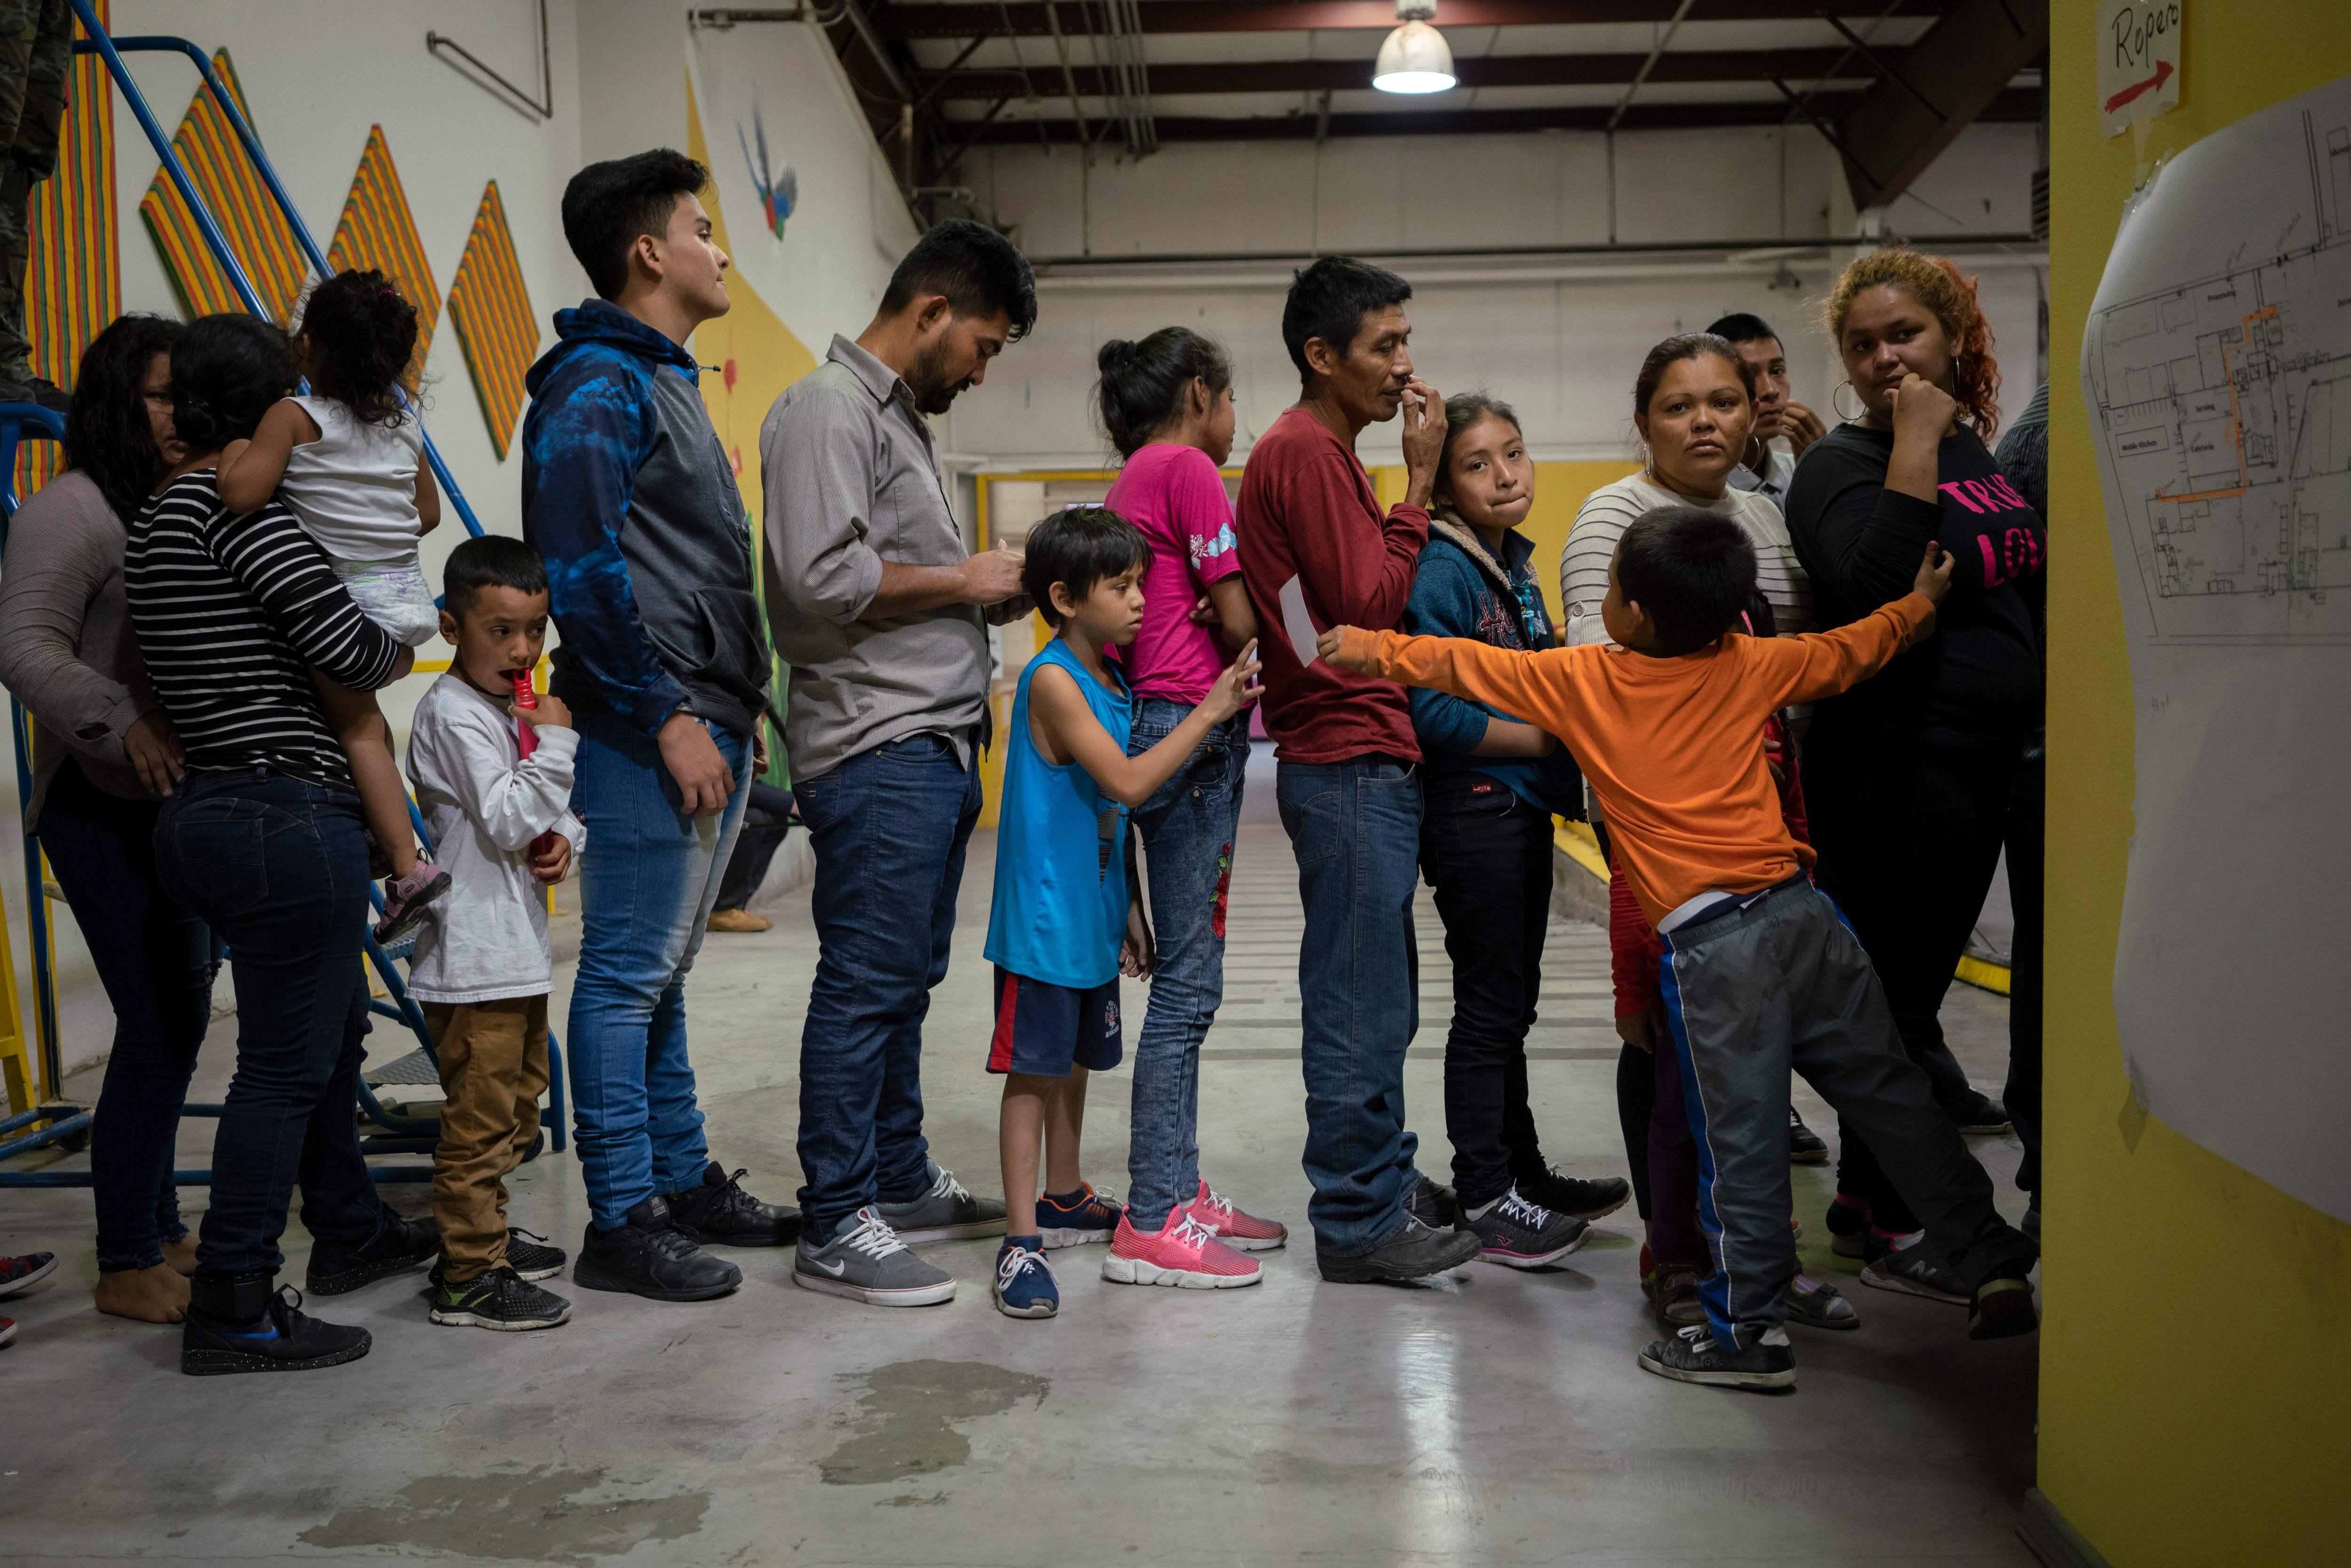 Migrantes a la espera de ser registrados. (Foto: Prensa Libre: AFP)